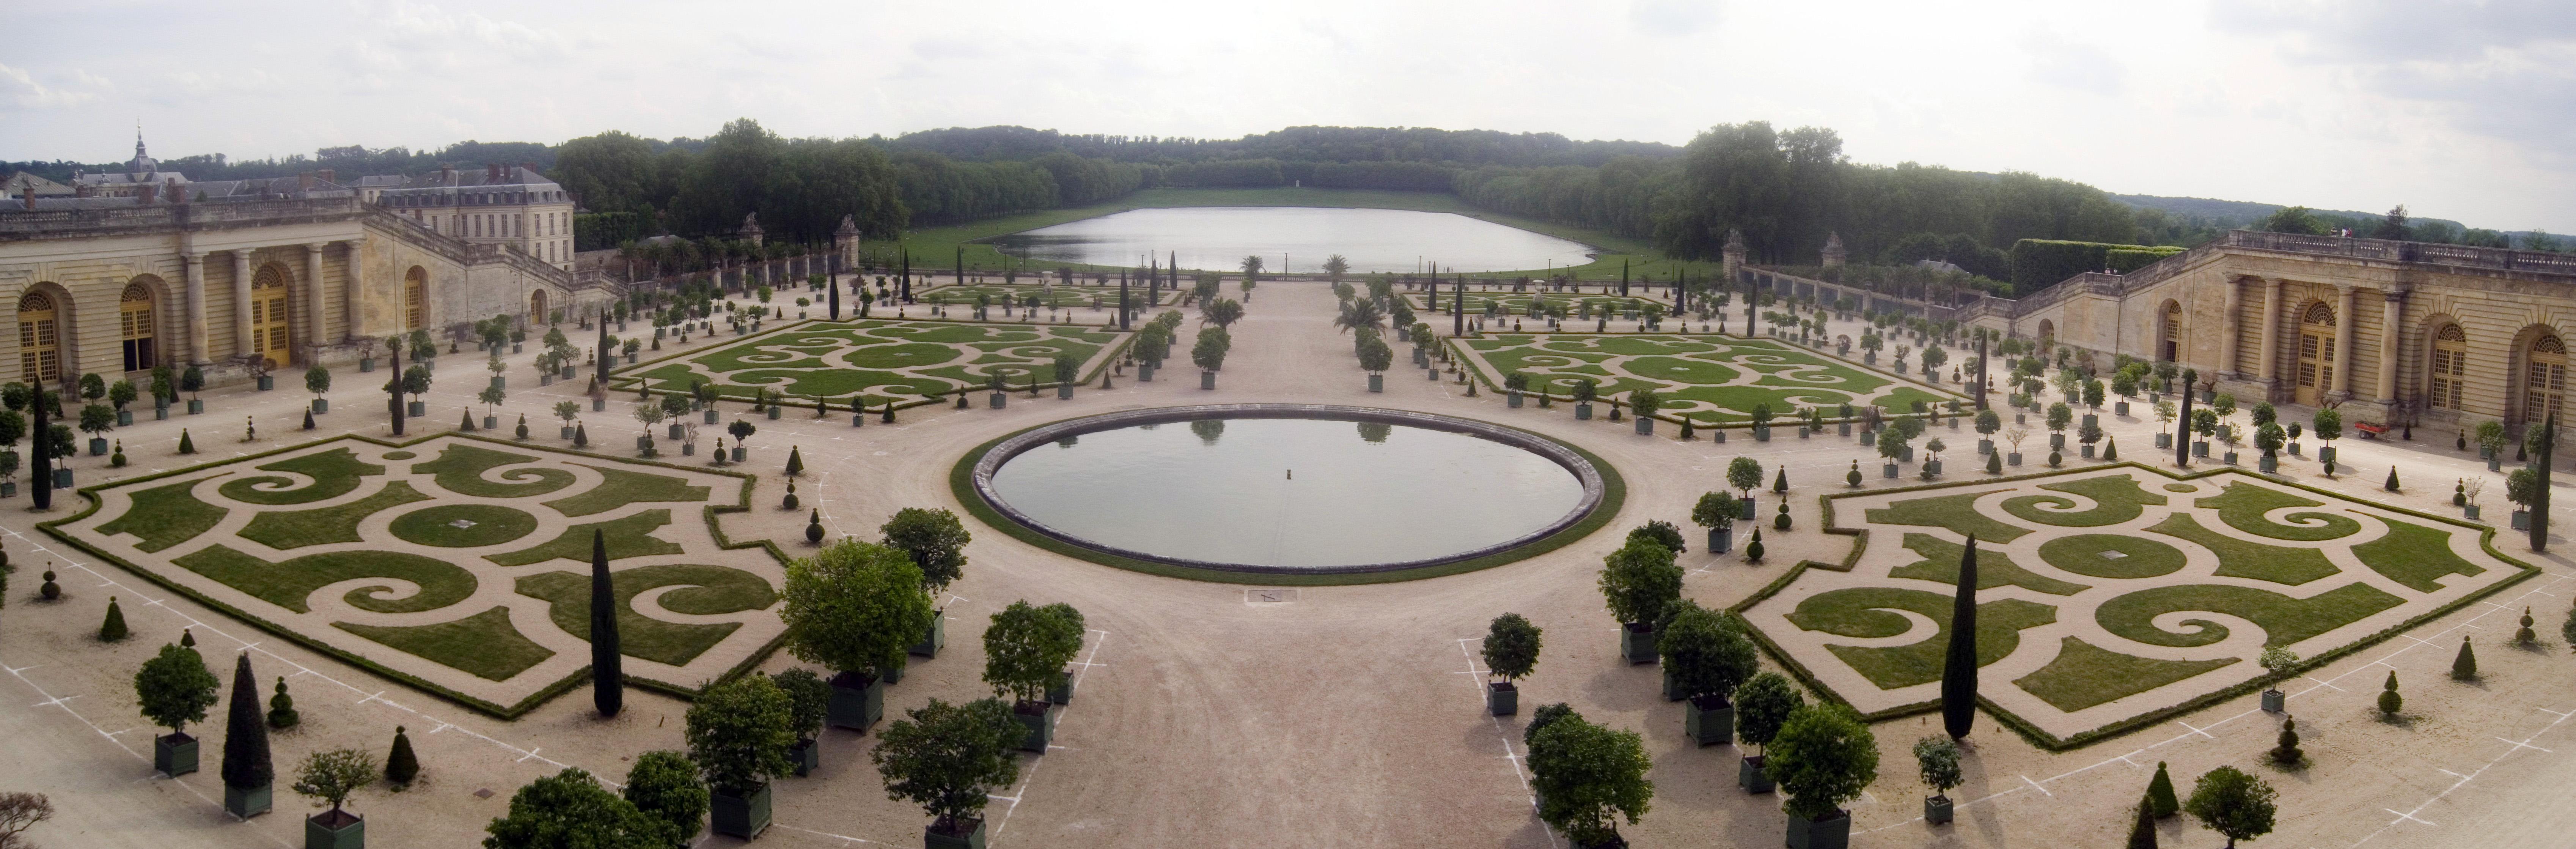 File:Parterre de l\'orangerie, Versailles.jpg - Wikimedia Commons